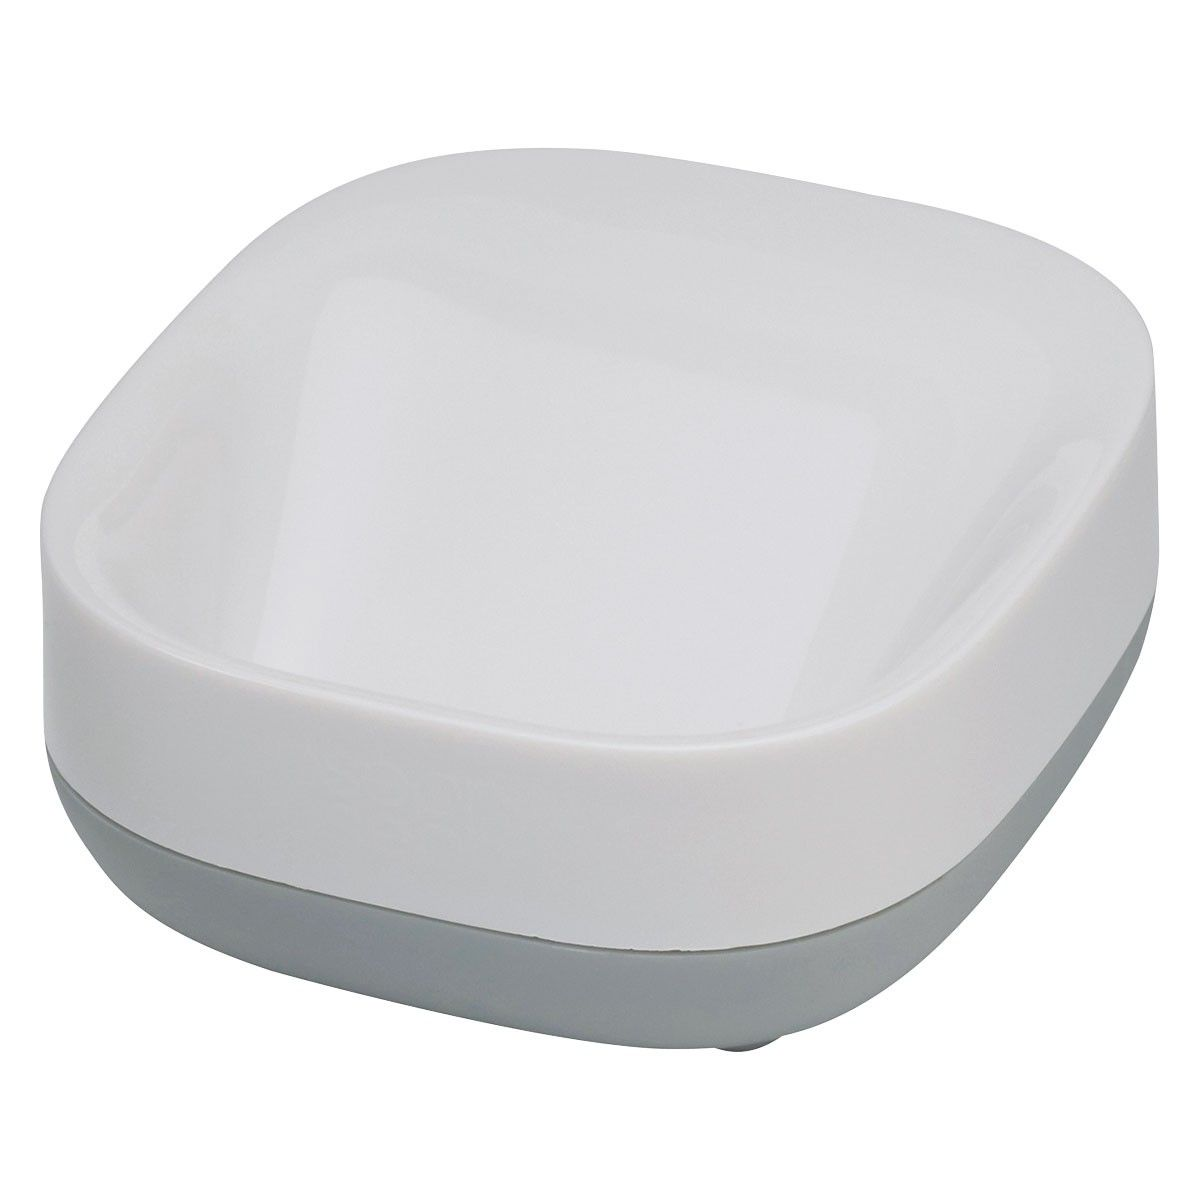 Joseph Joseph Slim White Grey Soap Dish Bathroom Accessories Stylish Bathroom